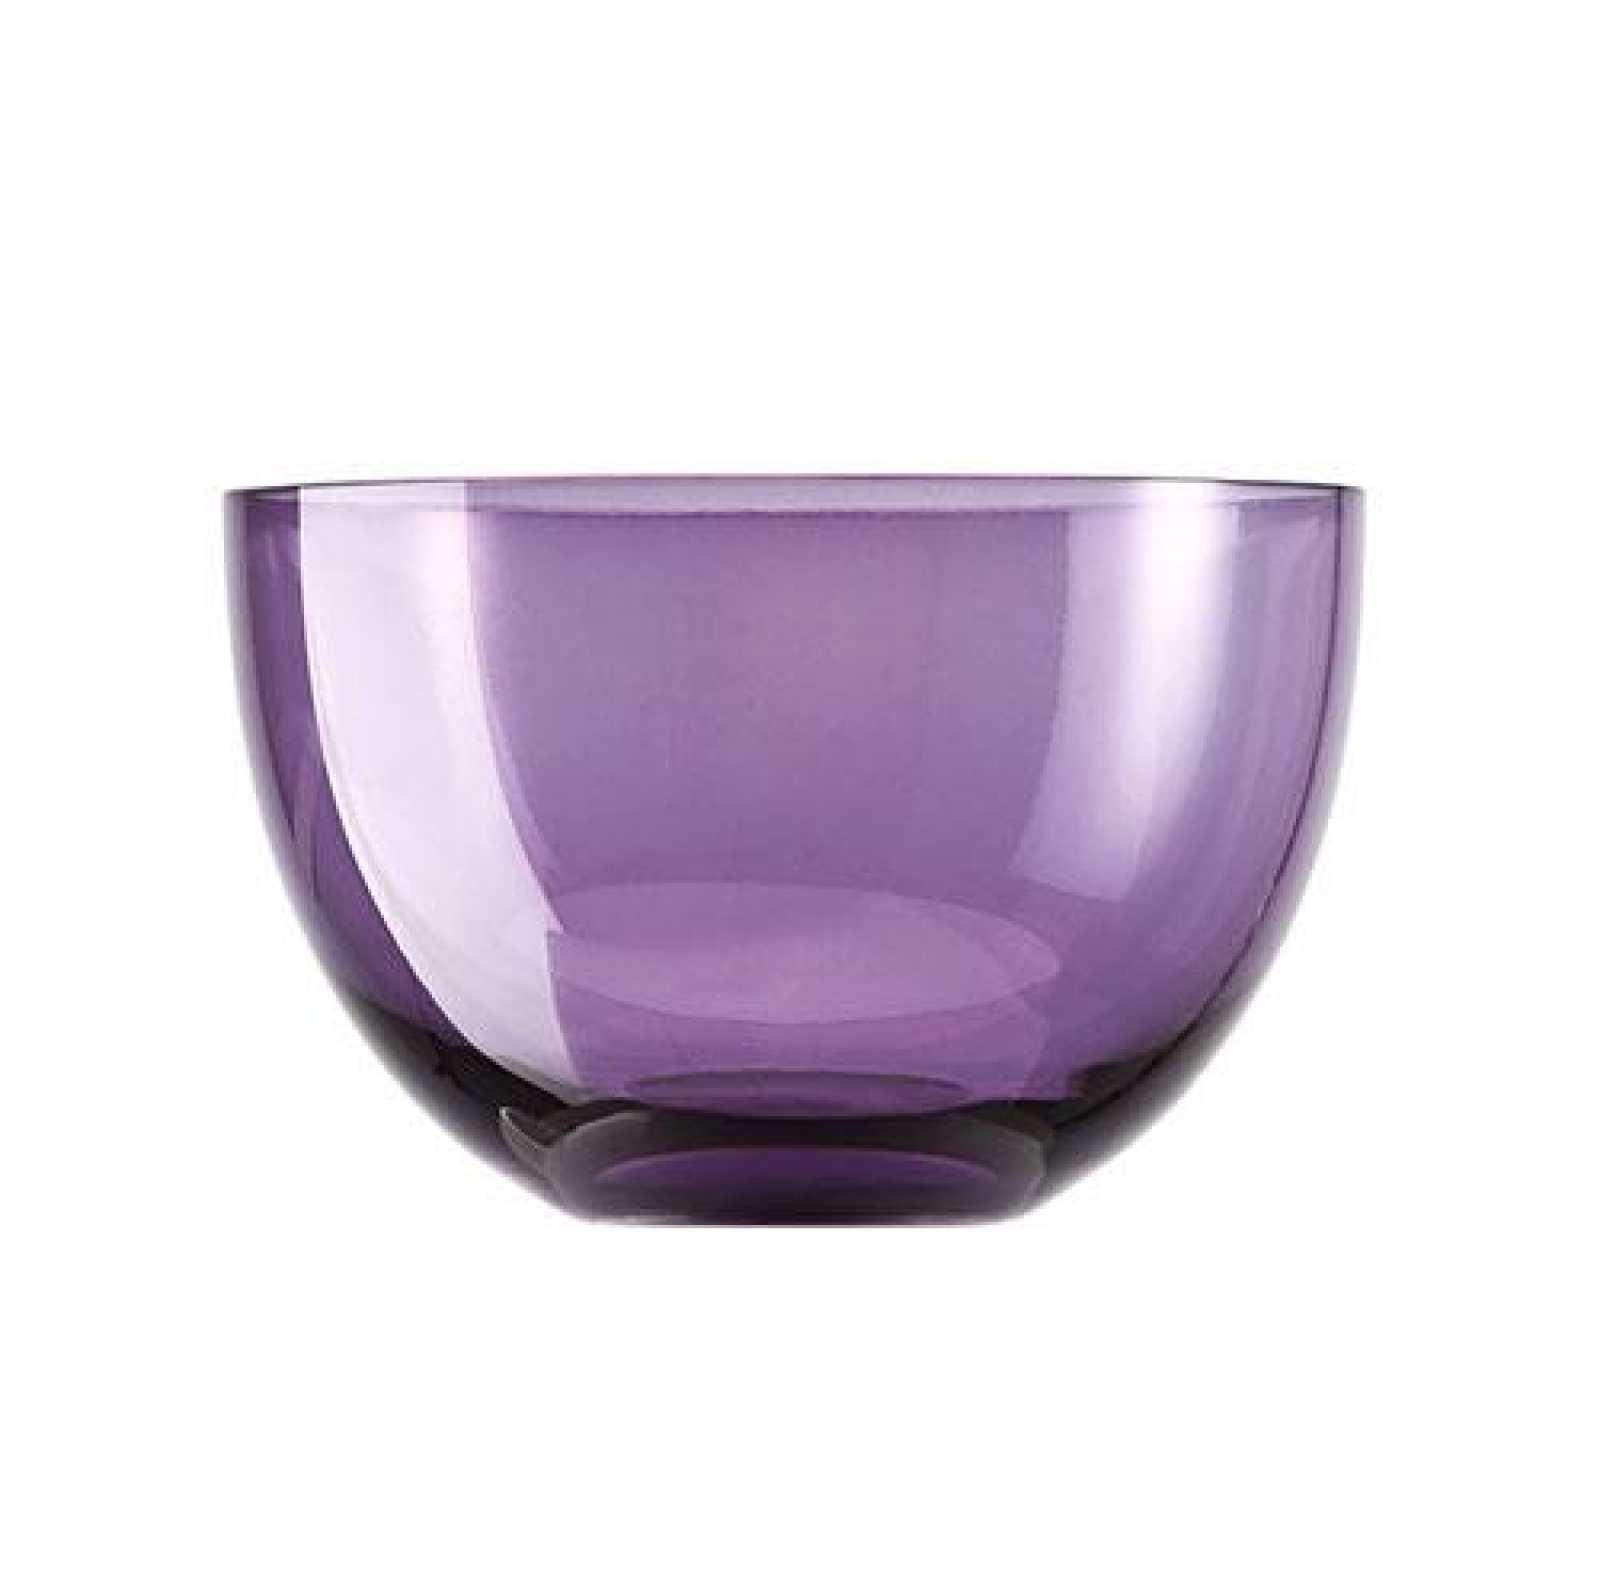 Пиала стеклянная Rosenthal SUNNY DAY, диаметр 12 см, фиолетовый Rosenthal 69034-408531-45312 фото 0